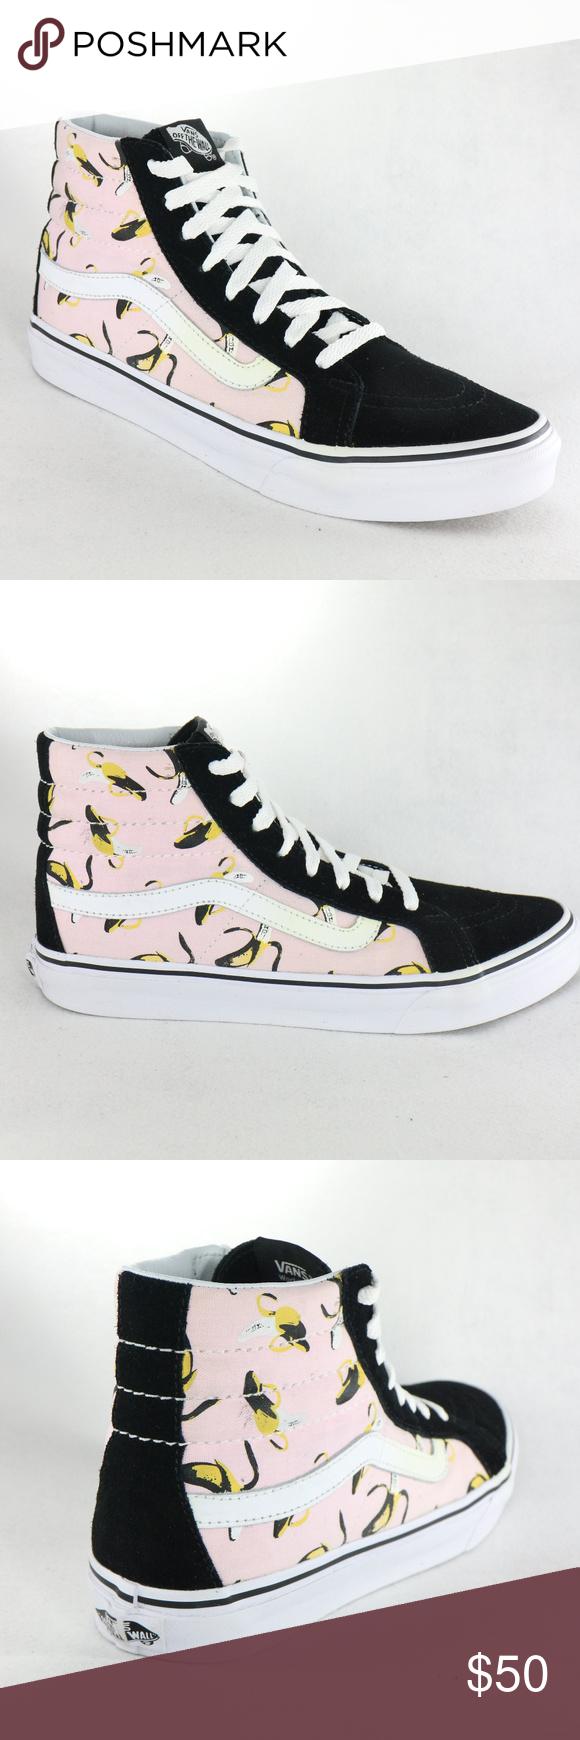 4bb68aad01764 Like New VANS SK8-Hi Slim Bananas/Ballerina Shoes RARE! Like new ...